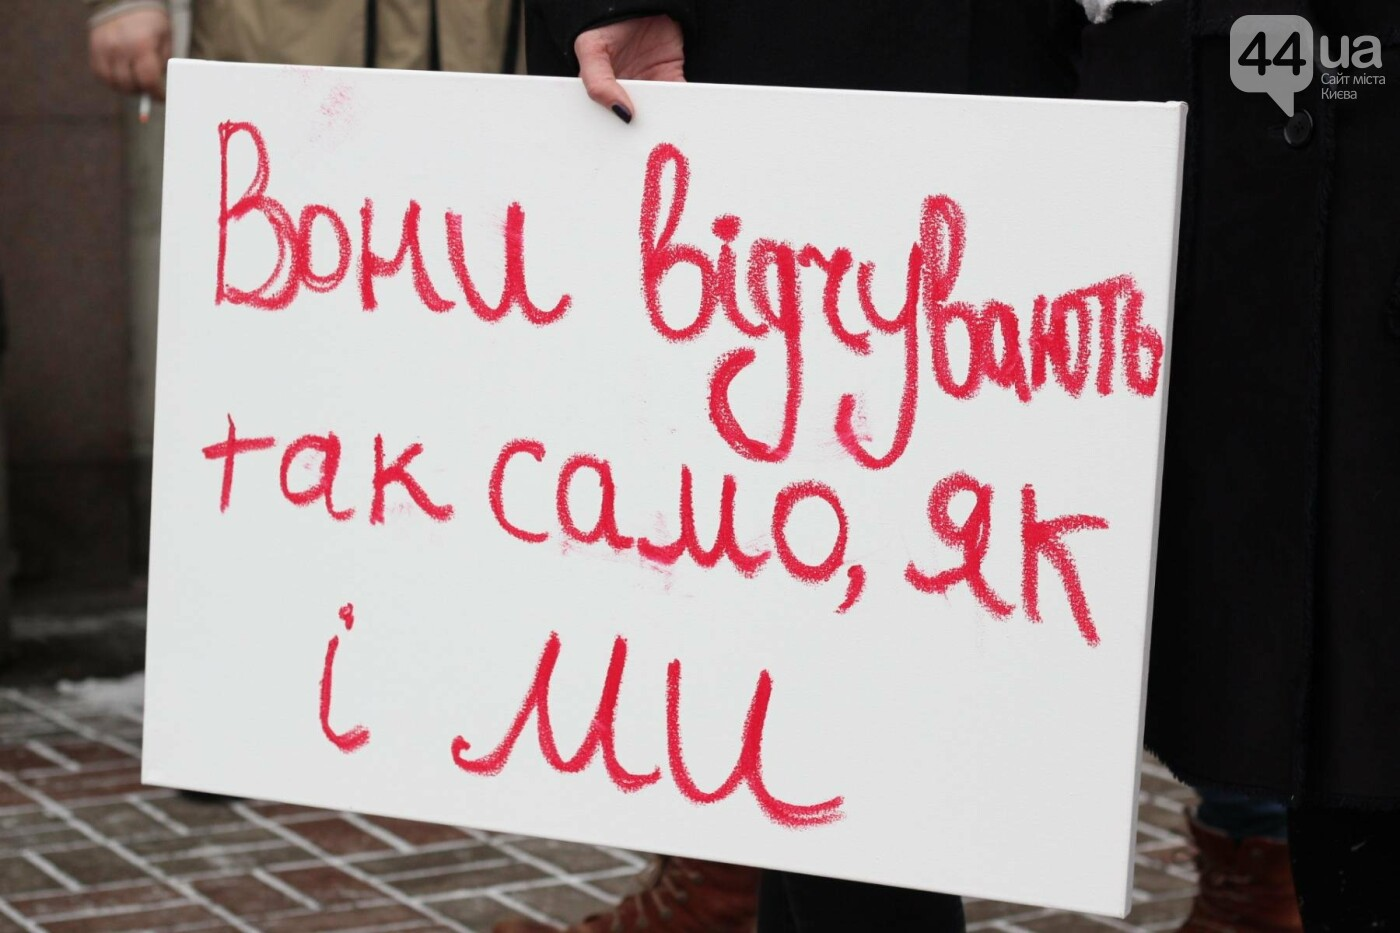 Цирк без животных: как в Киеве прошла акция протеста, фото-29